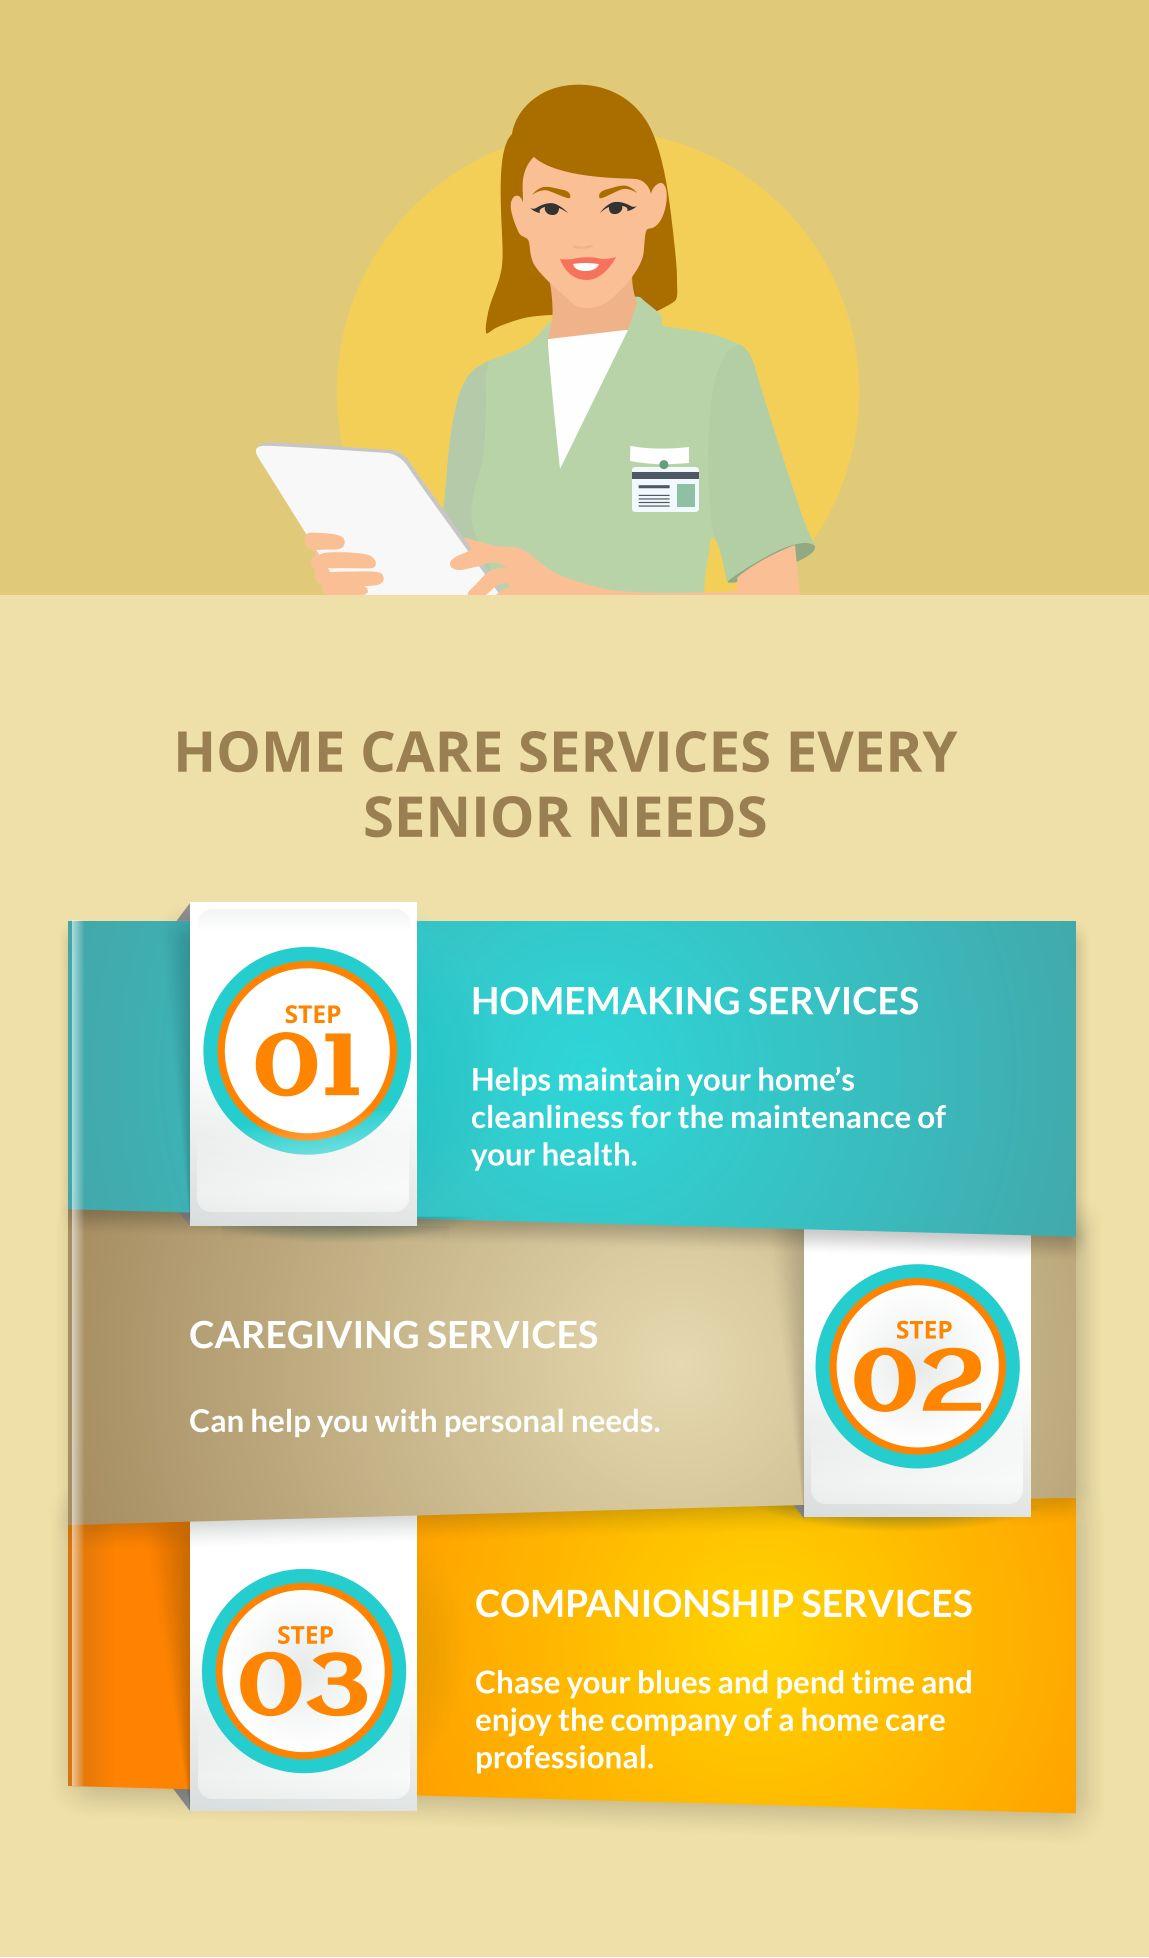 [INFOGRAPHIC] Home Care Services Every Senior Needs